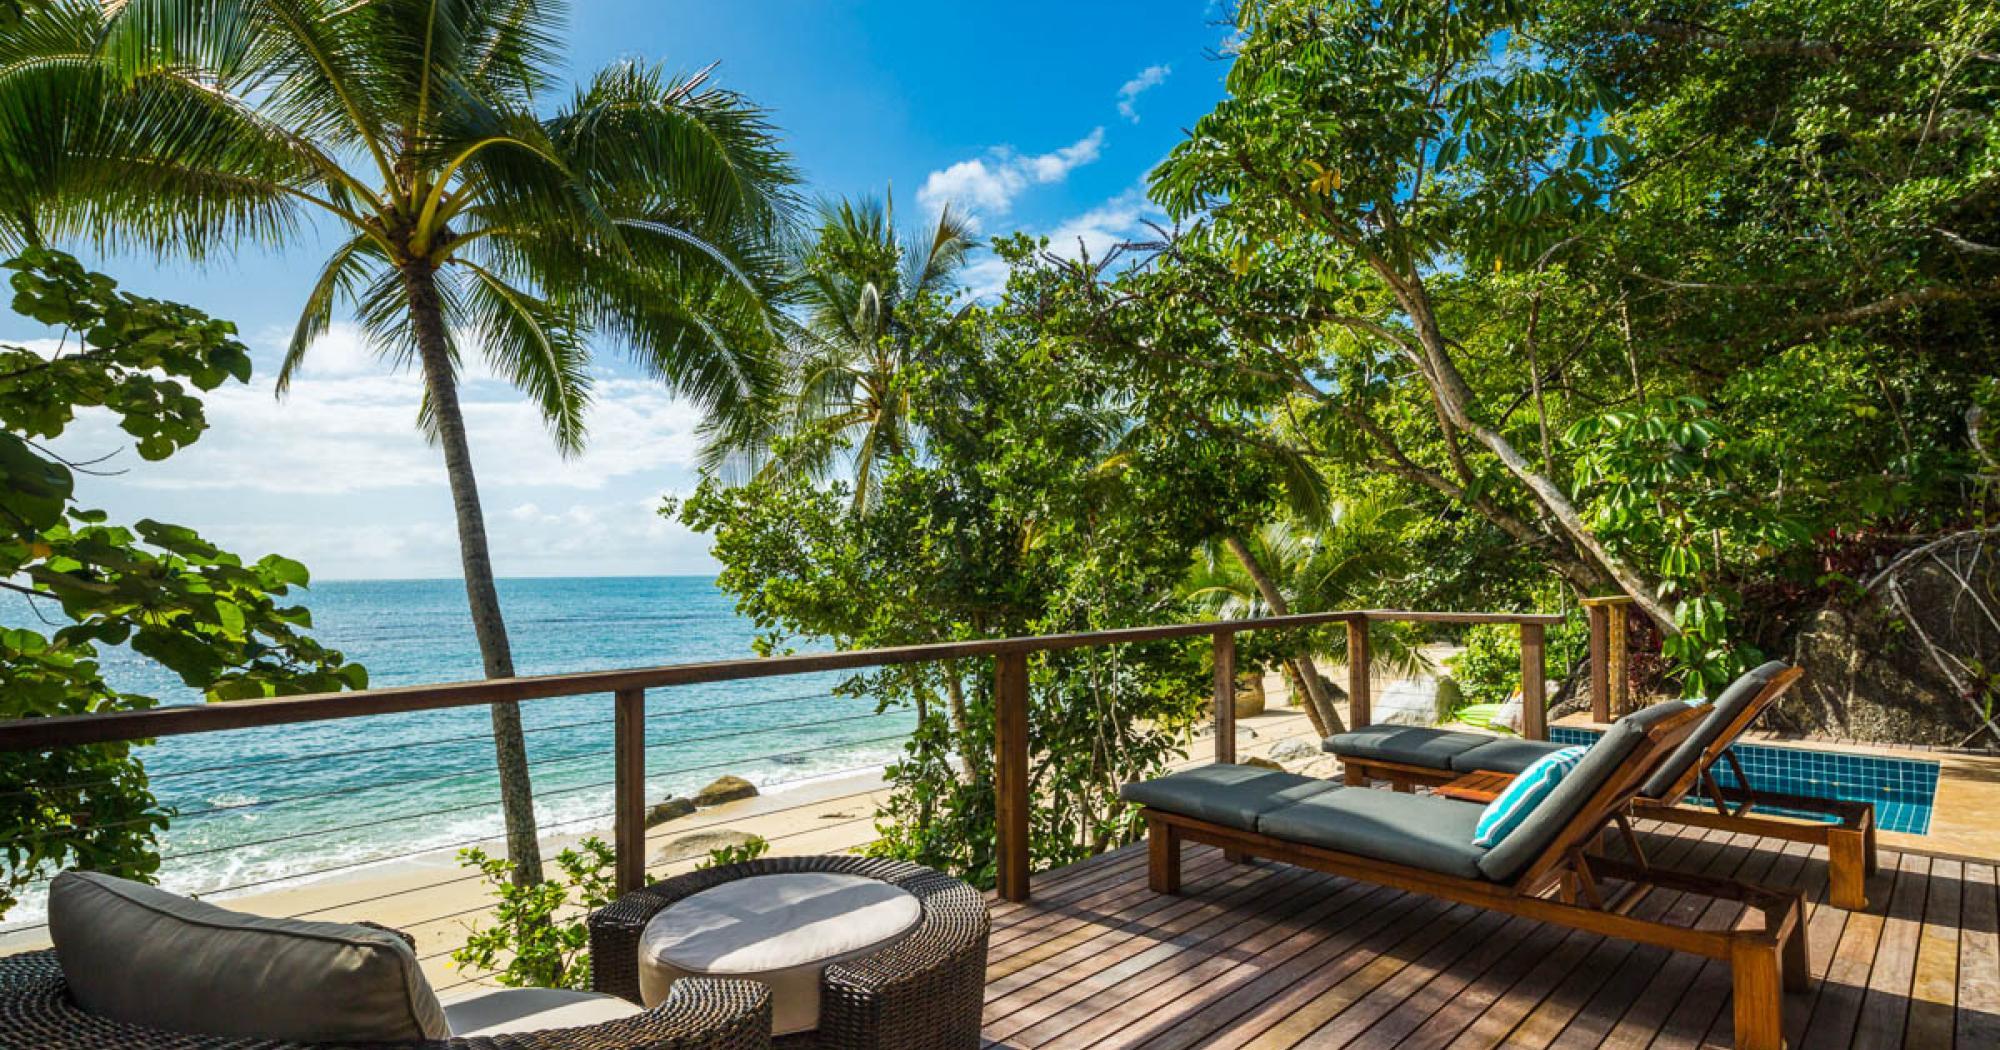 Bedarra Island Resort Great Barrier Reef